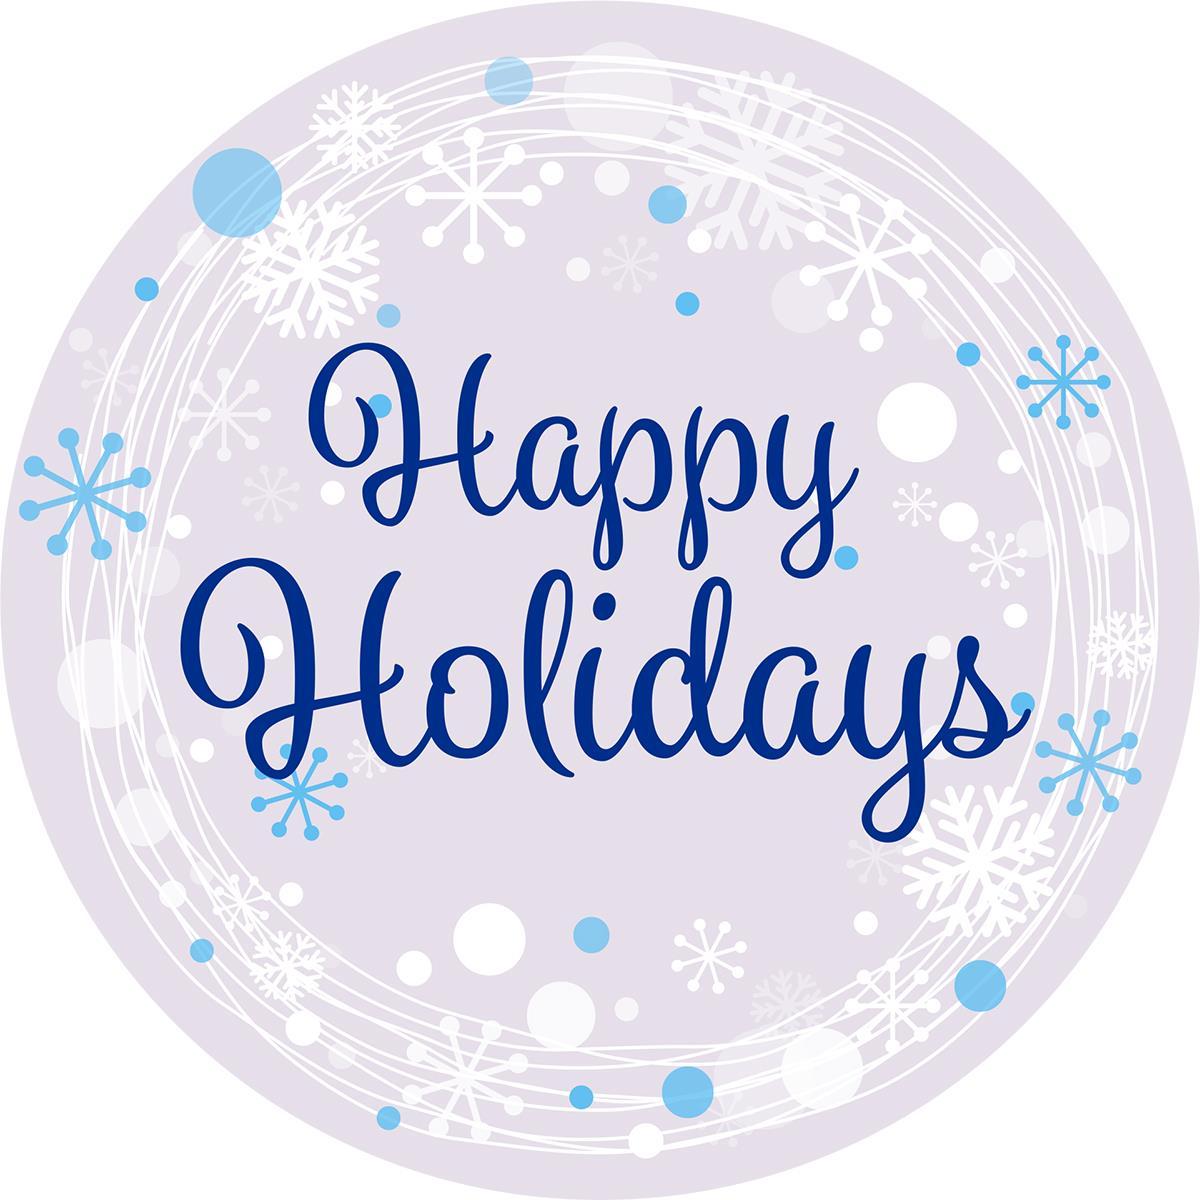 12 Quot X 12 Quot Round Quot Happy Holidays Quot Floor Decal Adhesive